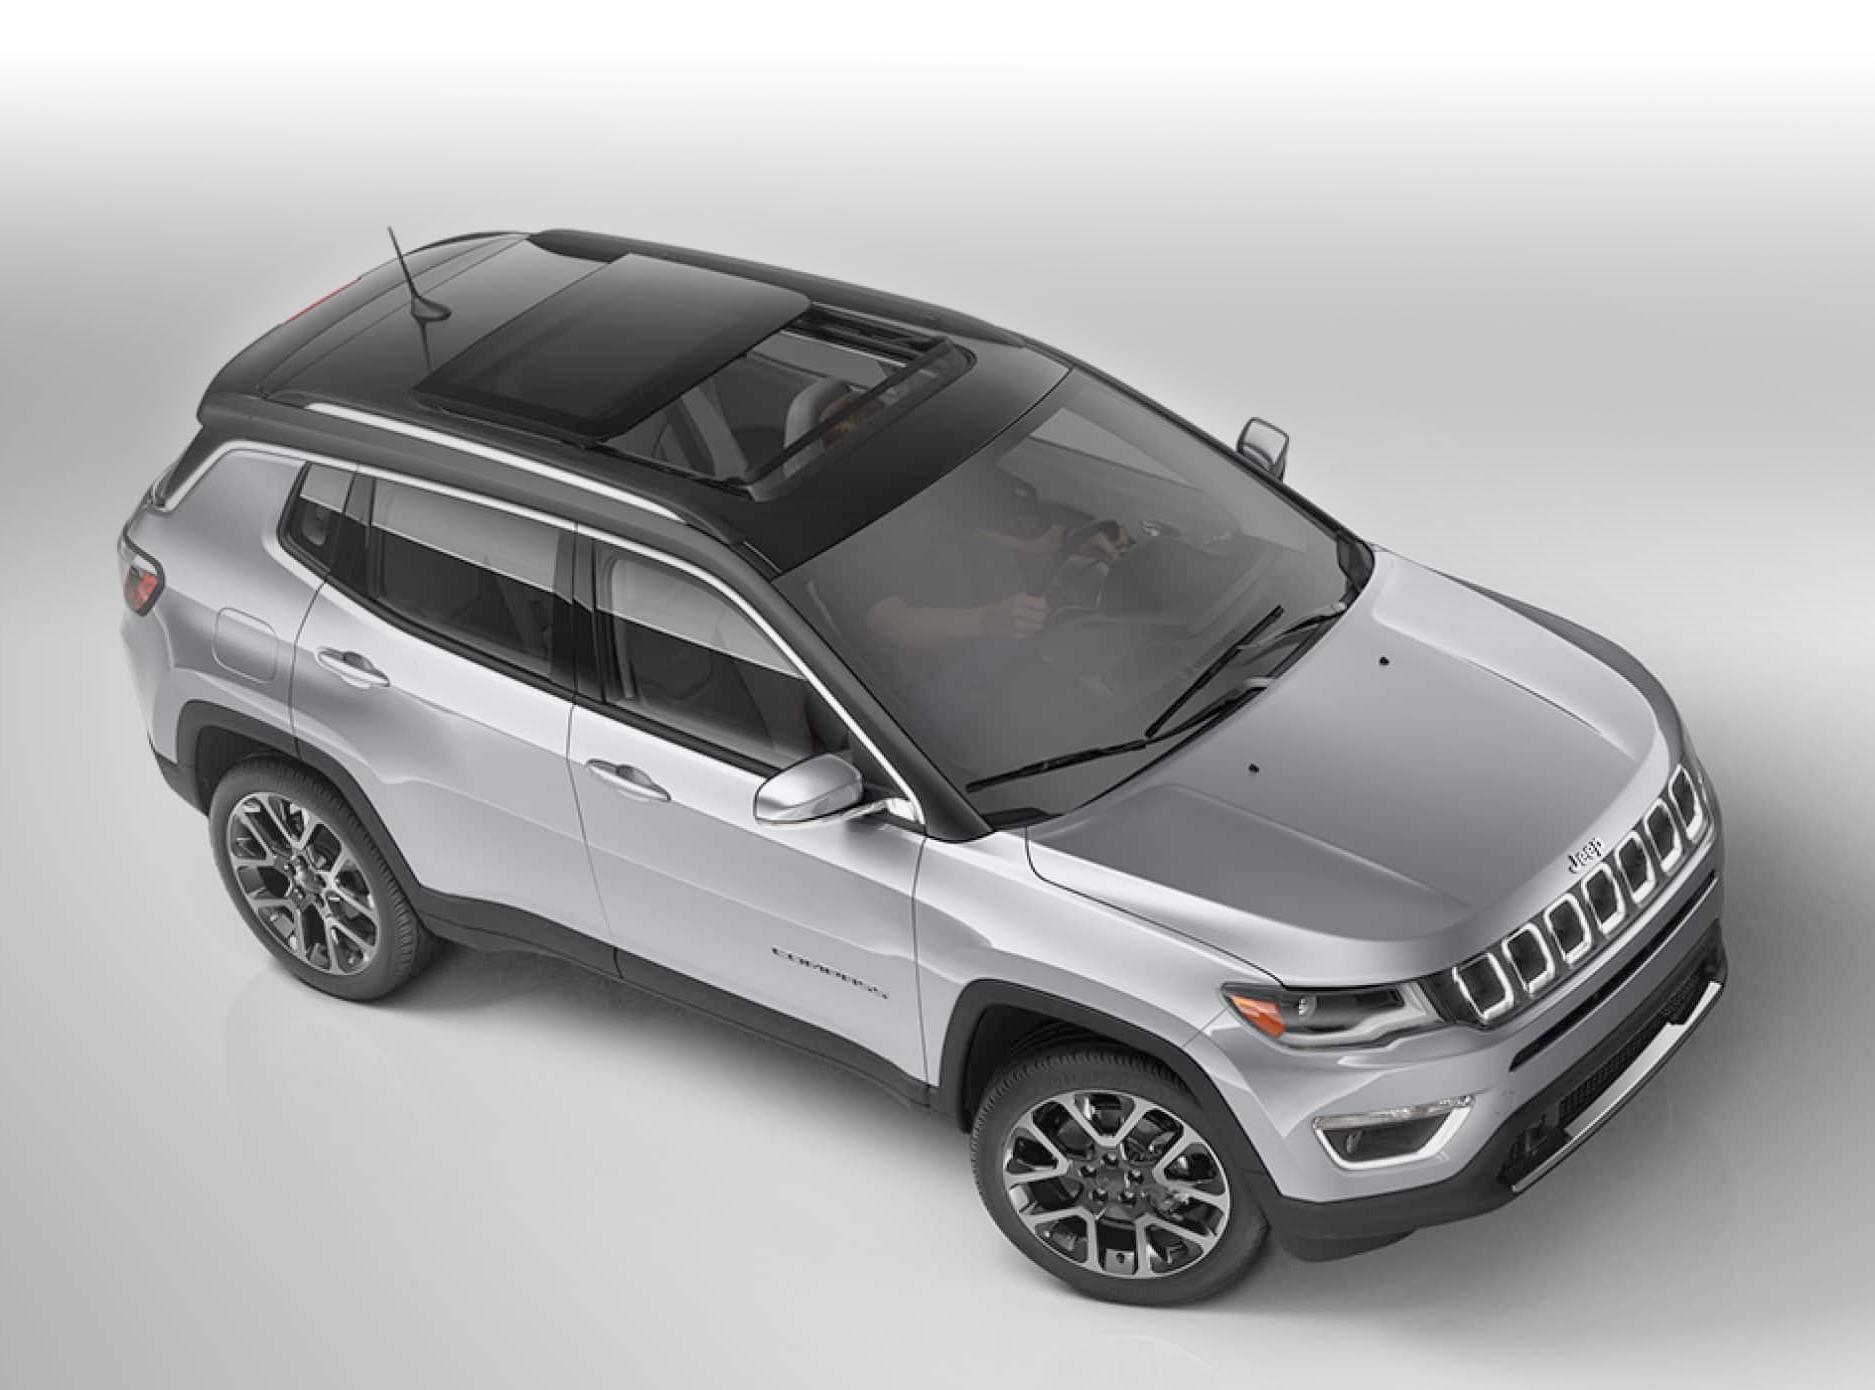 2020 Jeep Compass - Exterior